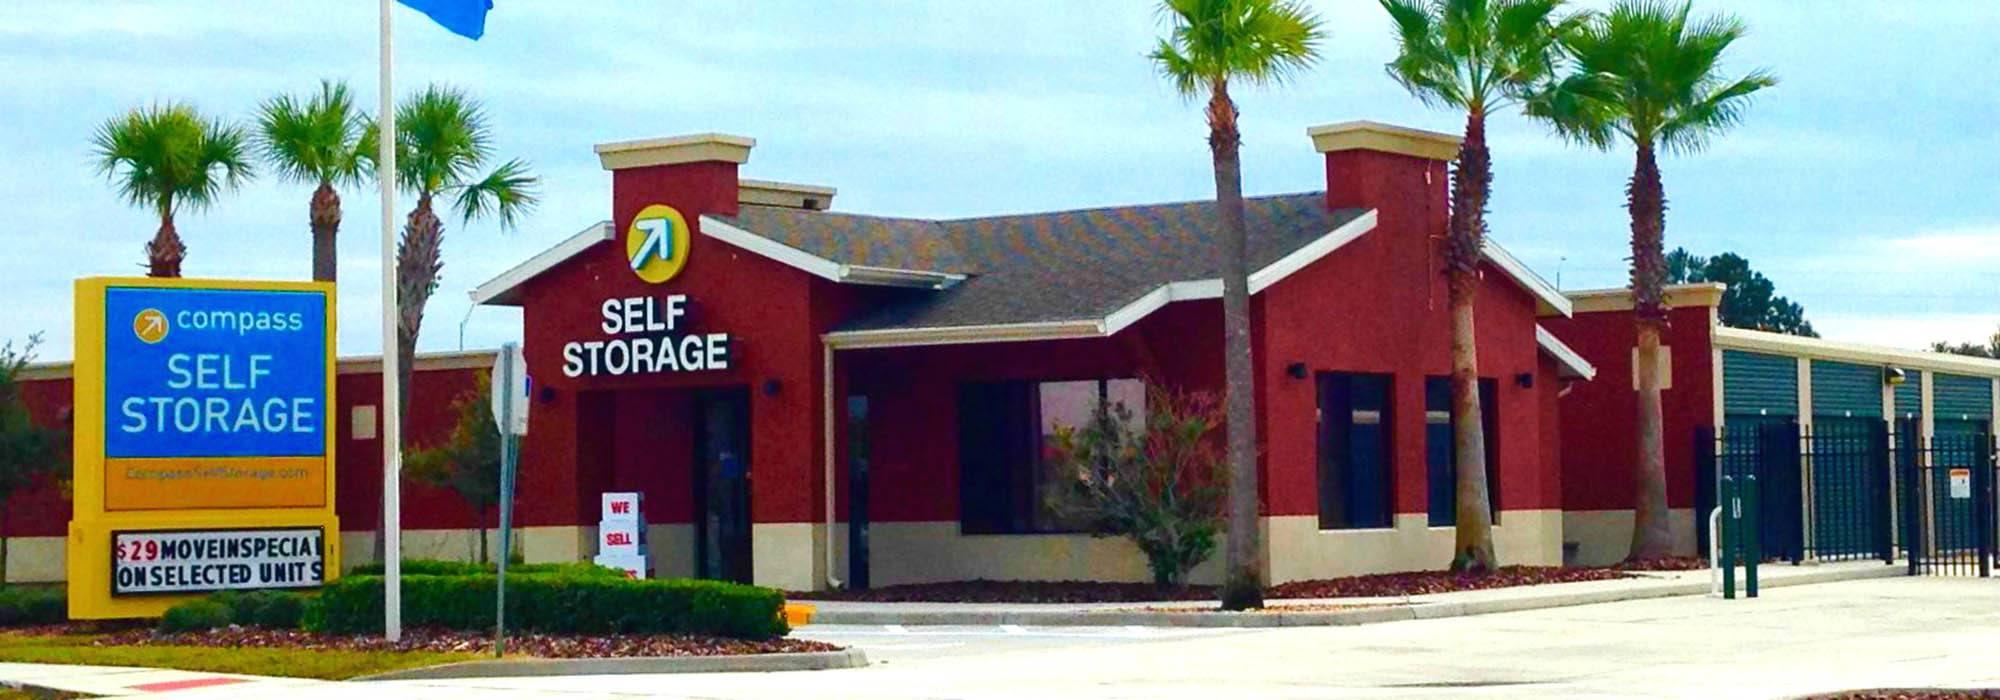 Self storage in Orlando FL